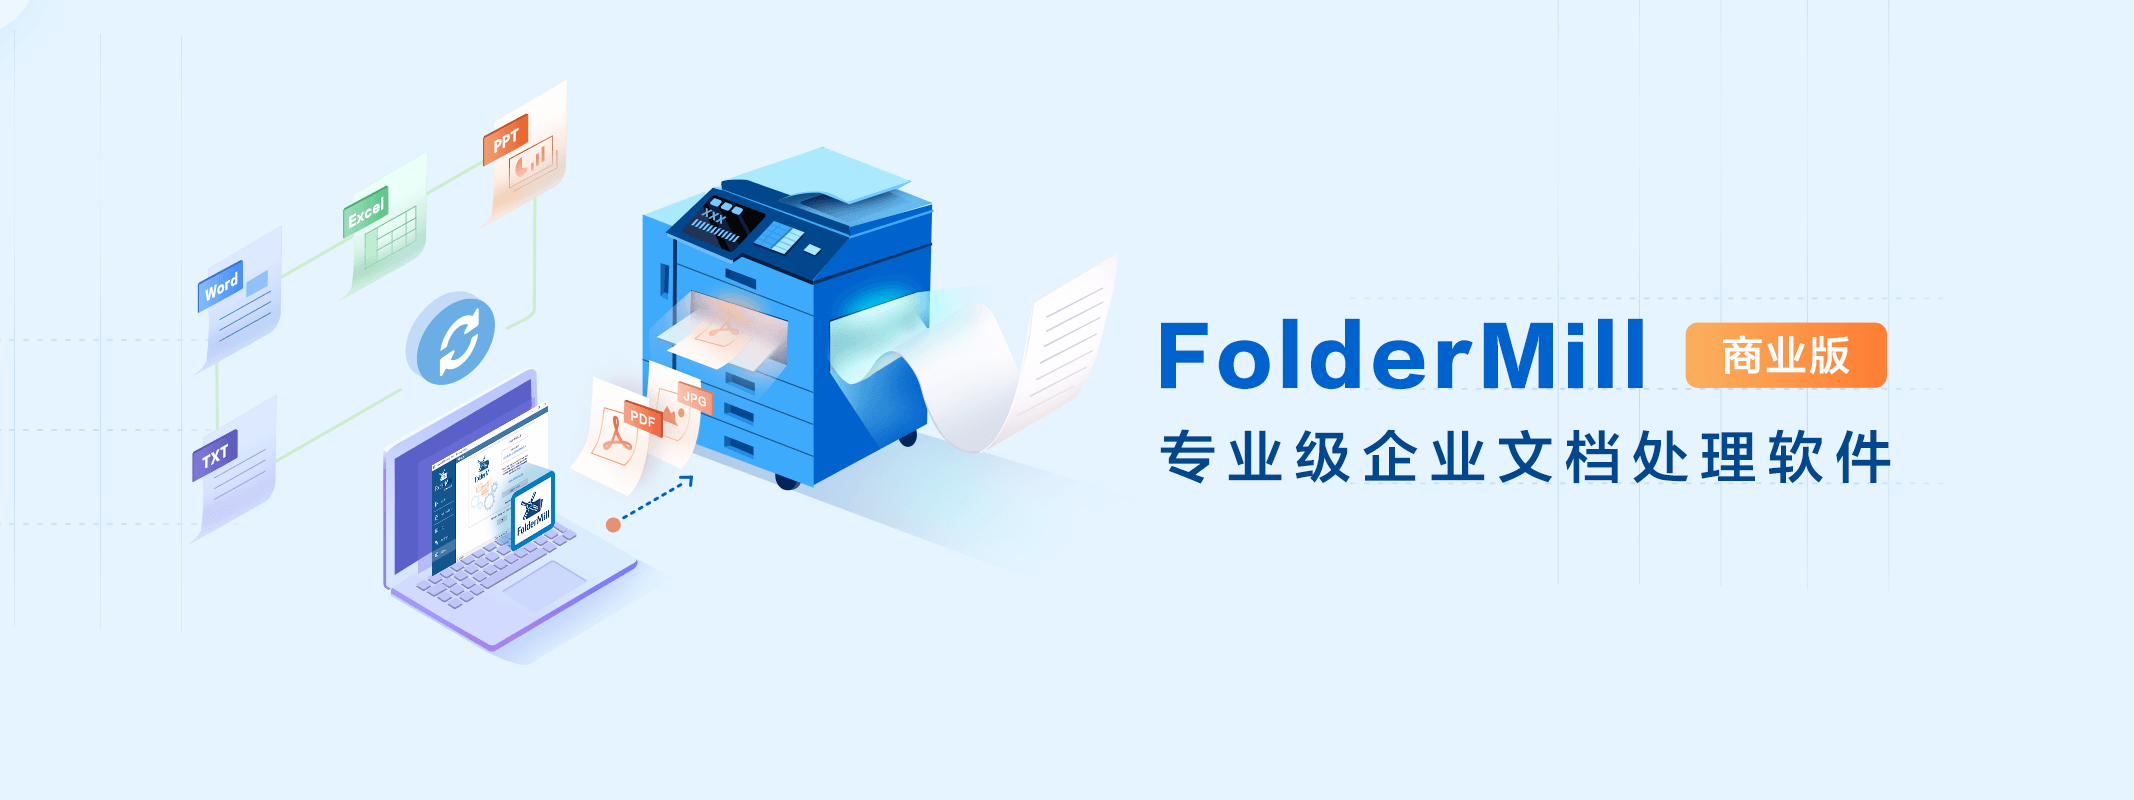 FolderMill:专业的企业文档处理软件